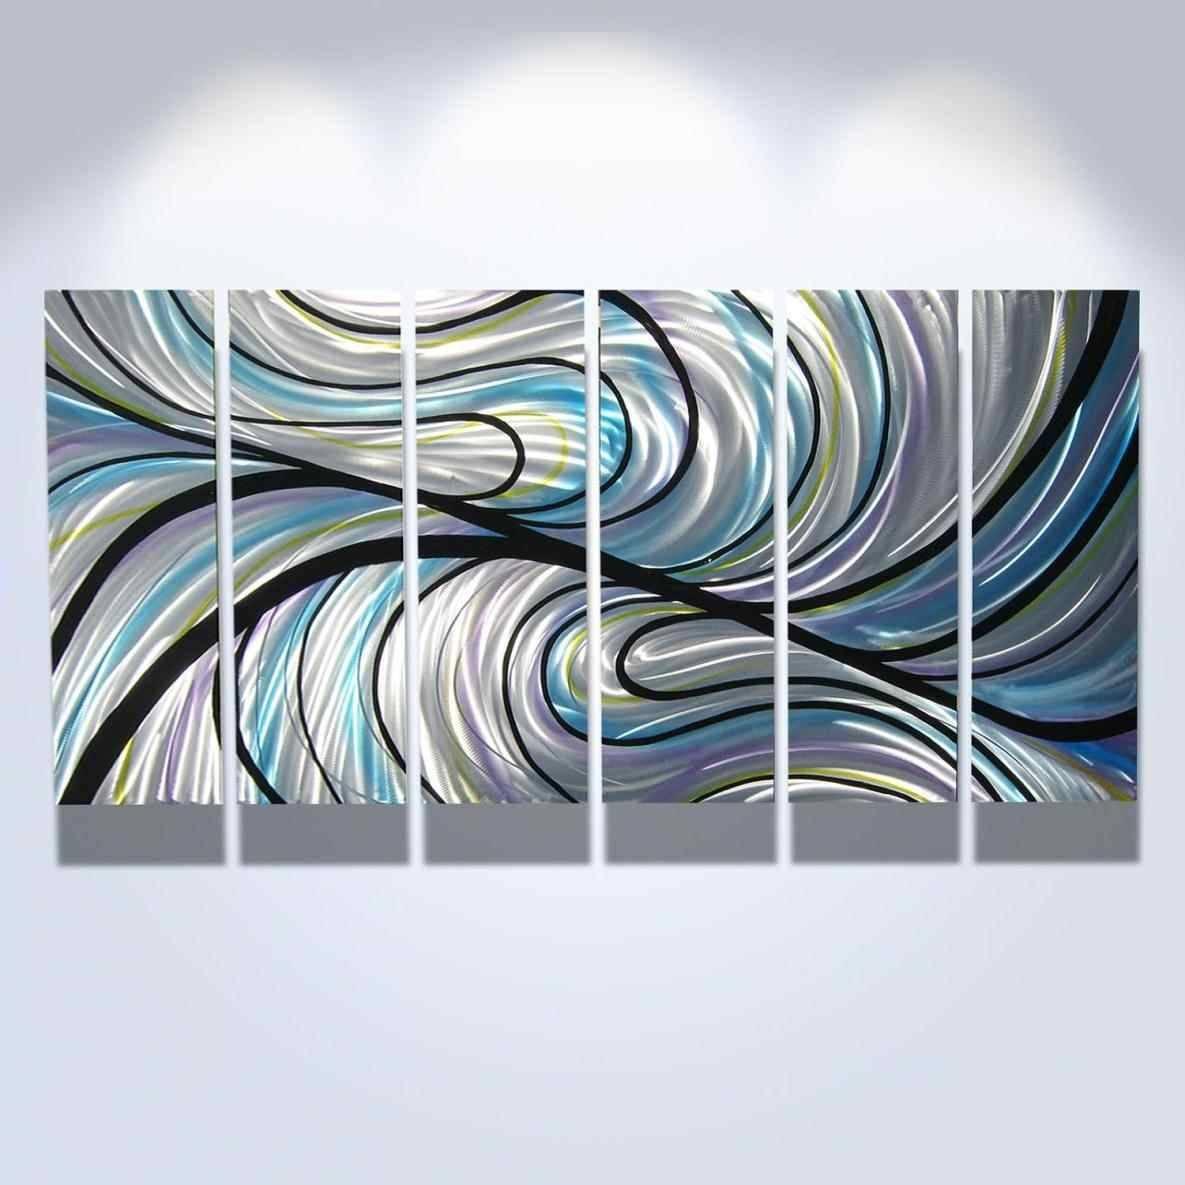 Swirl Metal Wall Art Home Interior Decor – Super Tech Regarding Current Swirl Metal Wall Art (View 2 of 20)